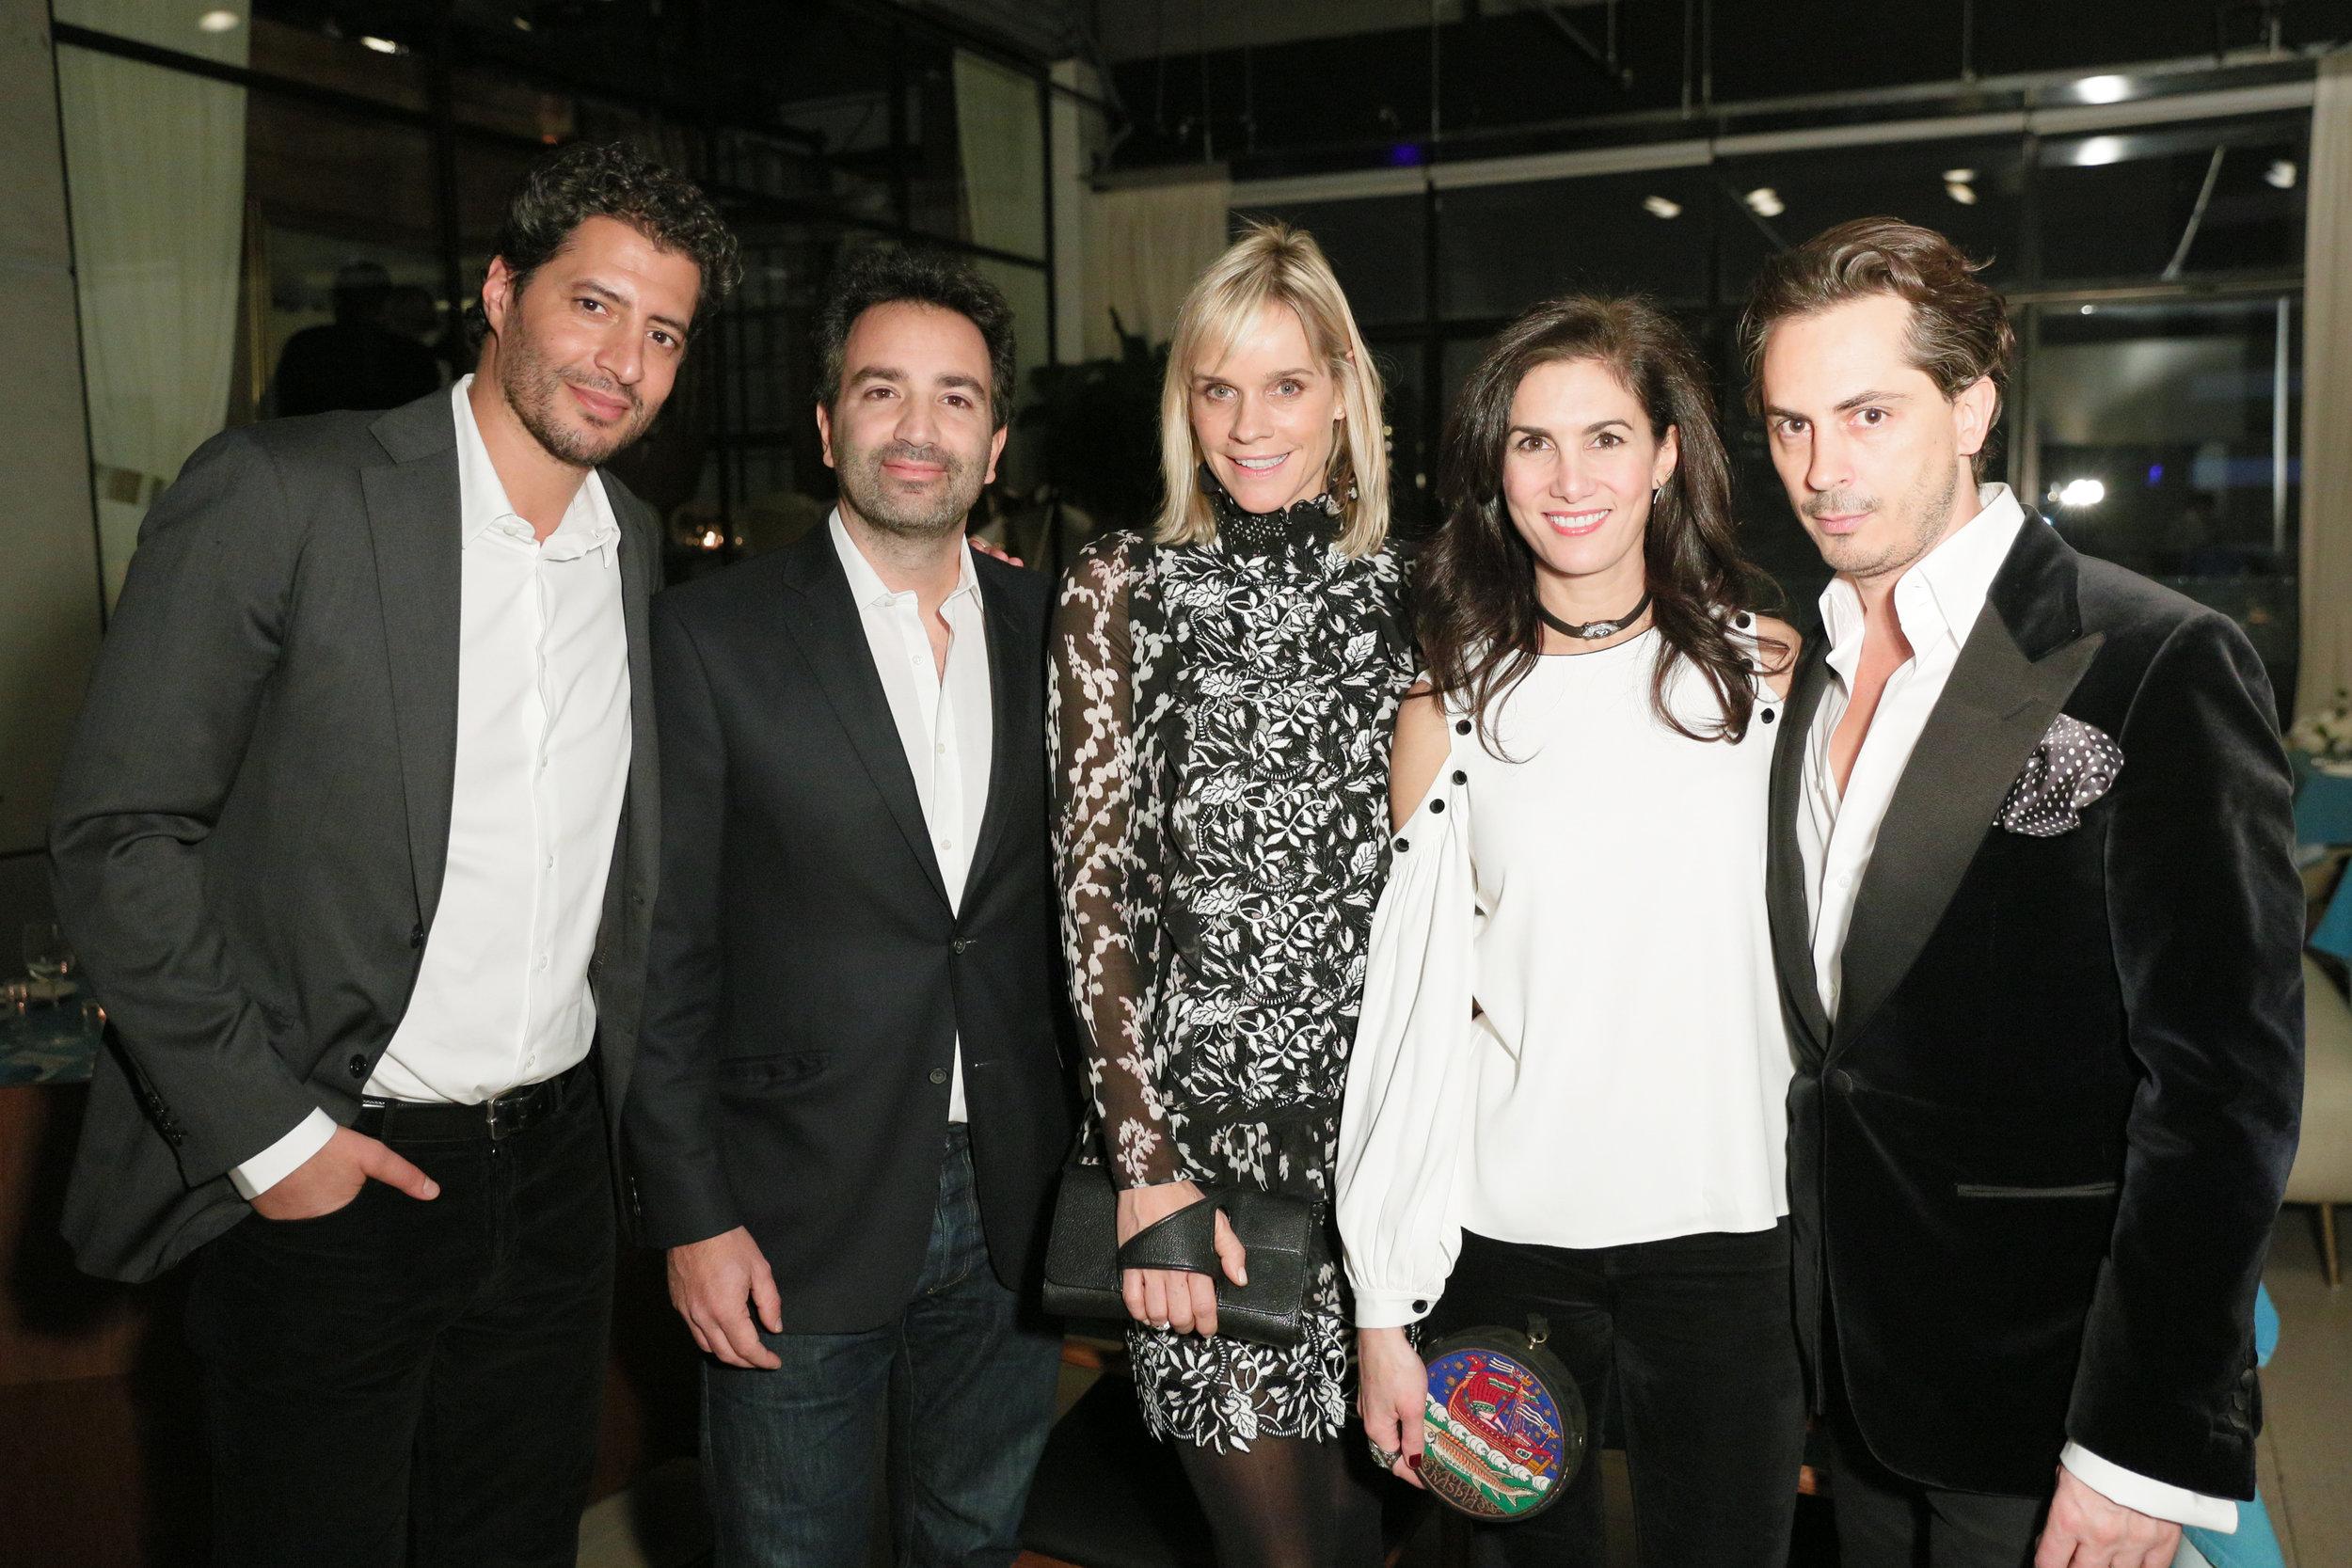 From left to right: Imad Izemrane, Francesco Costa, Anoushka Mac Crohon, Elisabeth Jones-Hennessy, Kilian Hennessy.